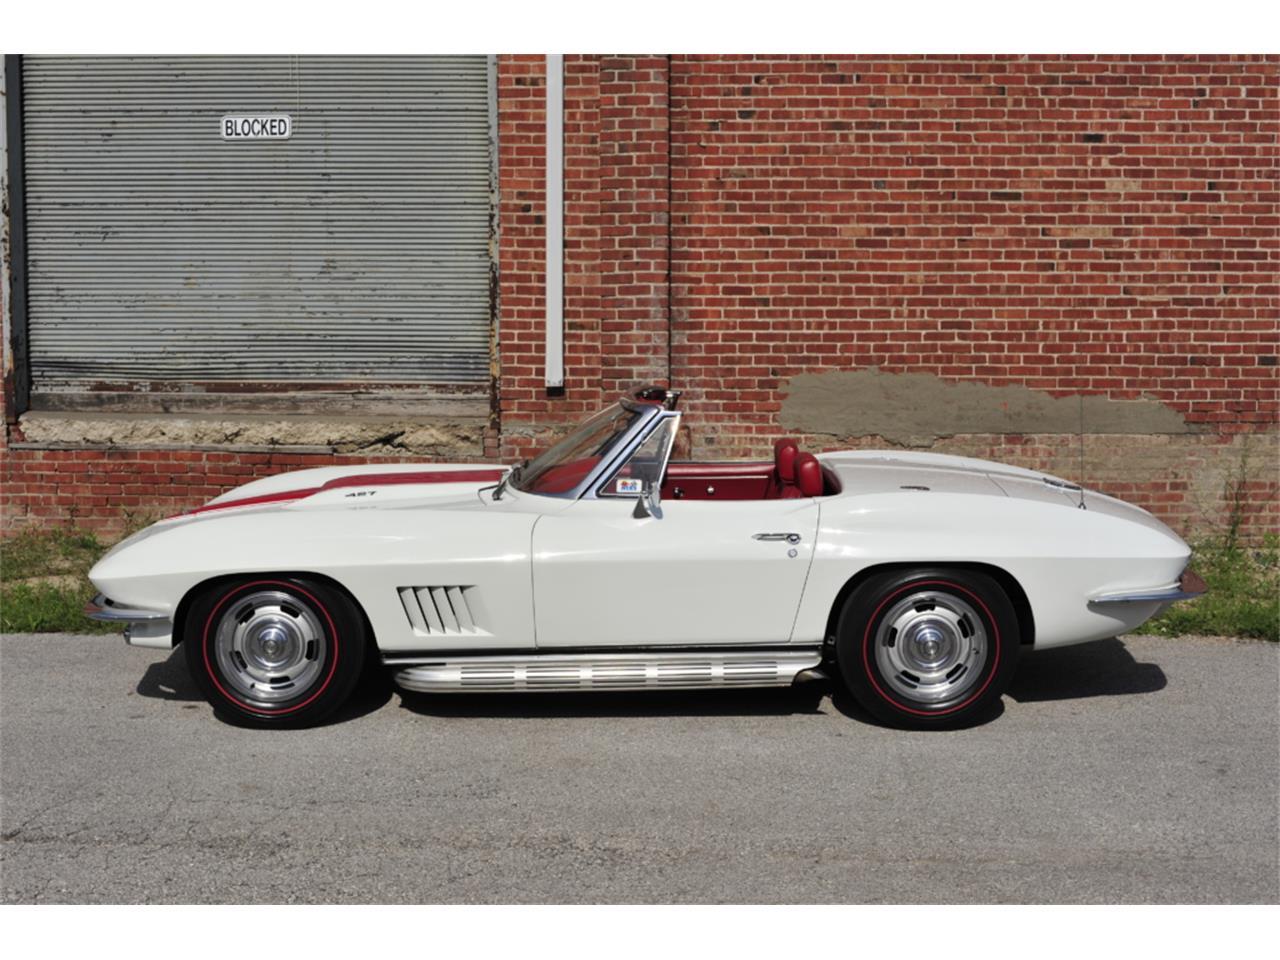 Large Picture of Classic 1967 Chevrolet Corvette located in N. Kansas City Missouri - $129,995.00 - PZ9R